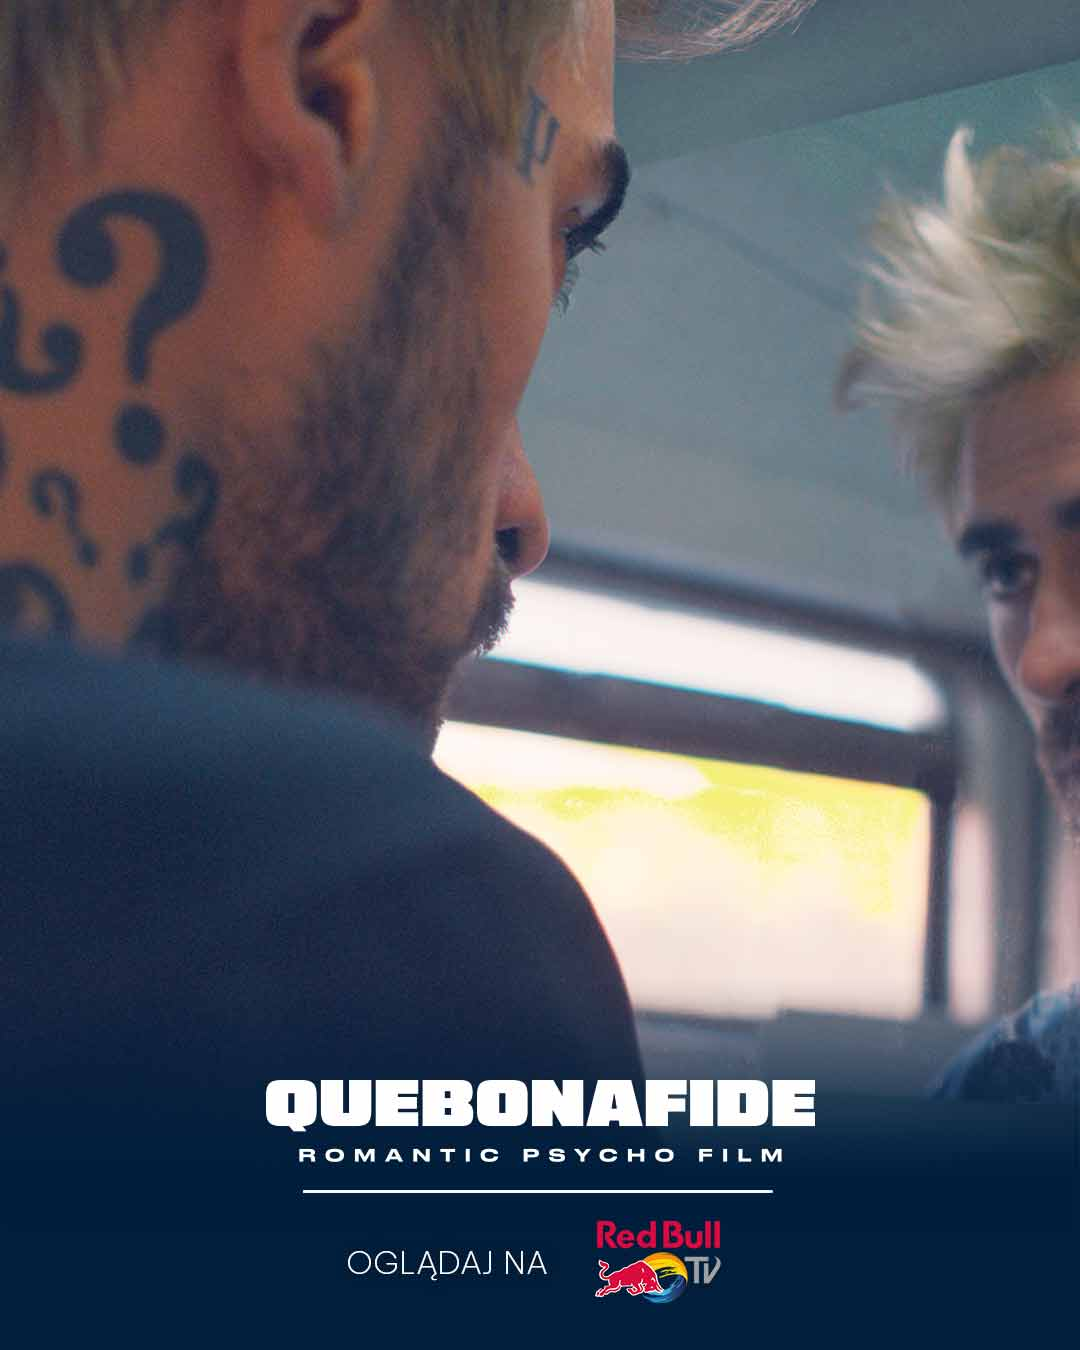 Quebonafide Romantic Psycho Film